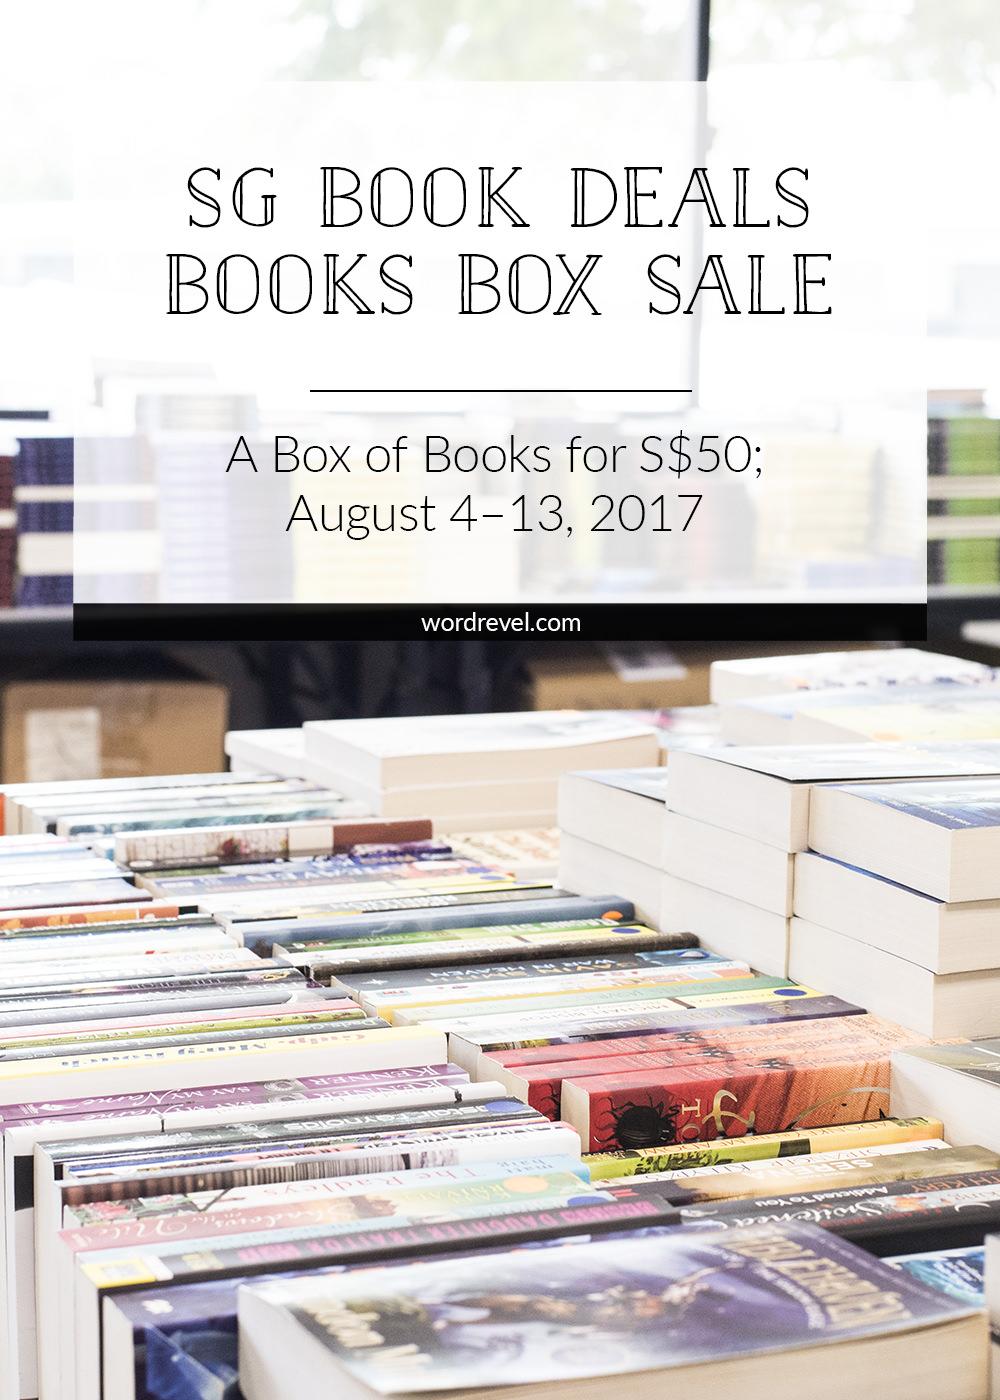 SG Book Deals Books Box Sale 2017